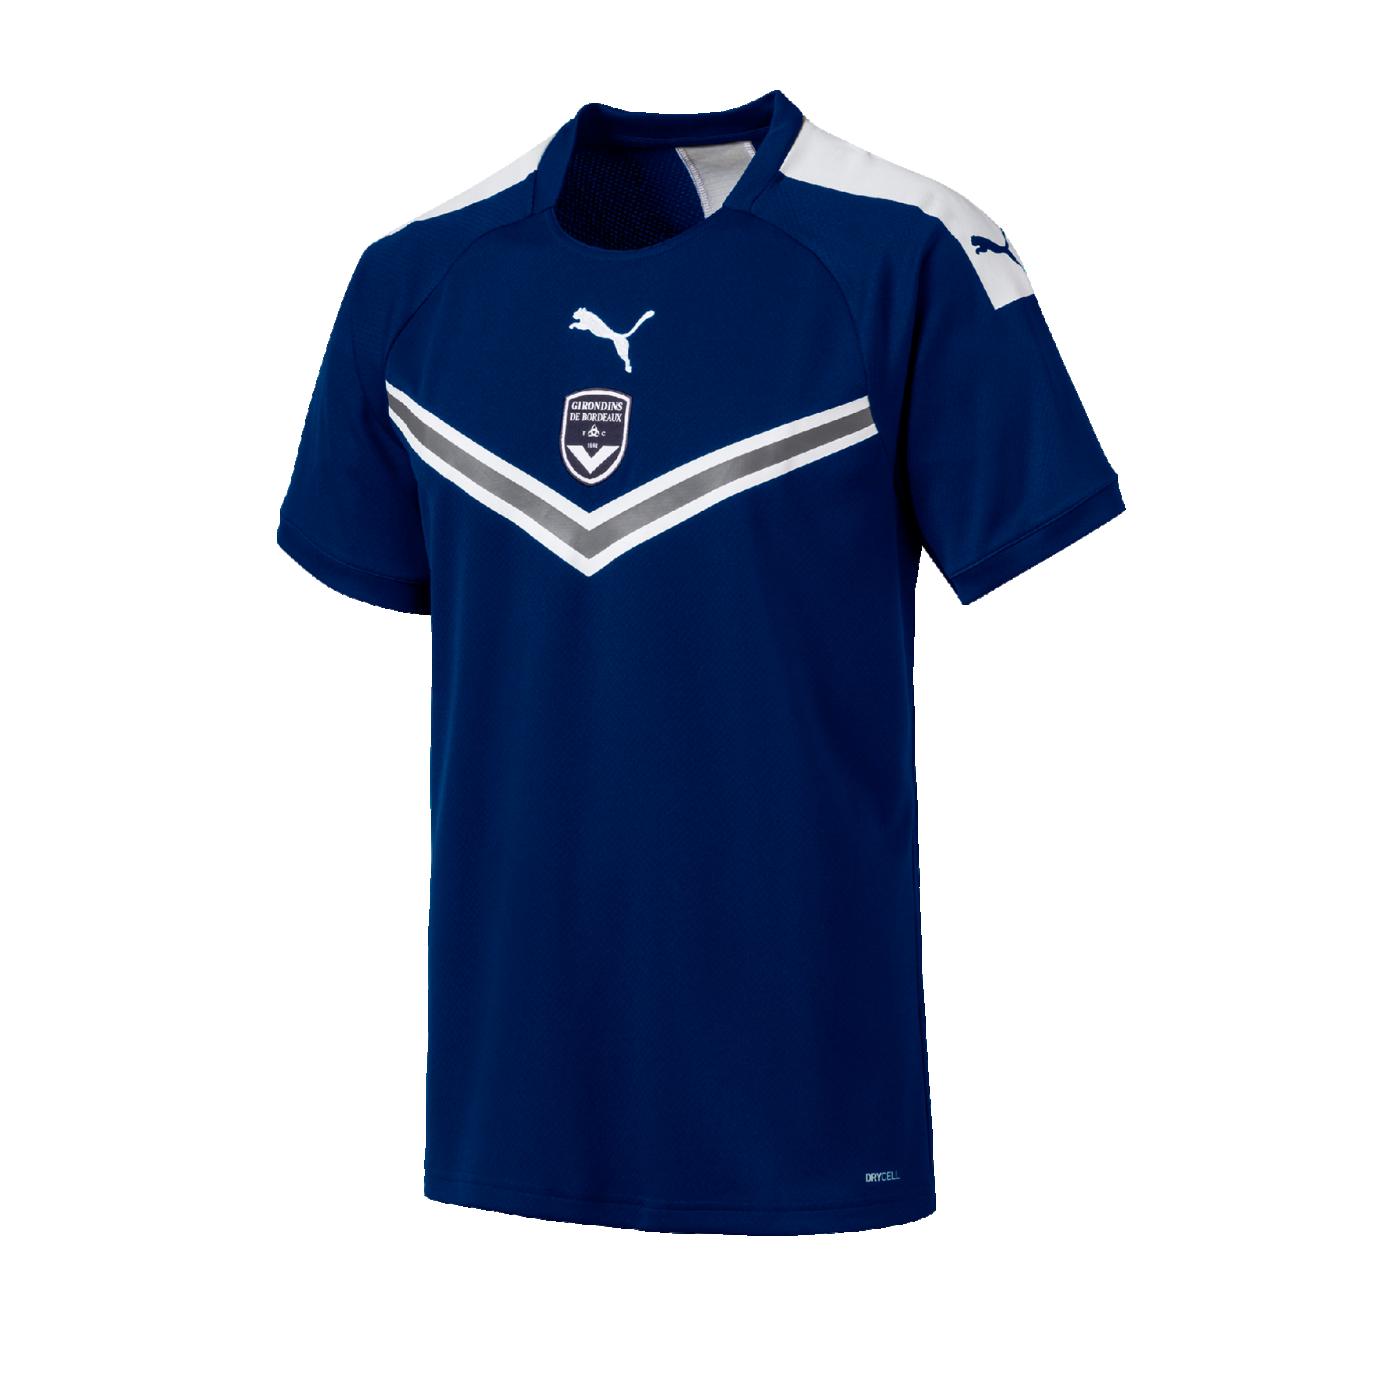 PUMA FC Girondins de Bordeaux Trikot H 2019/20 F01 - Blau